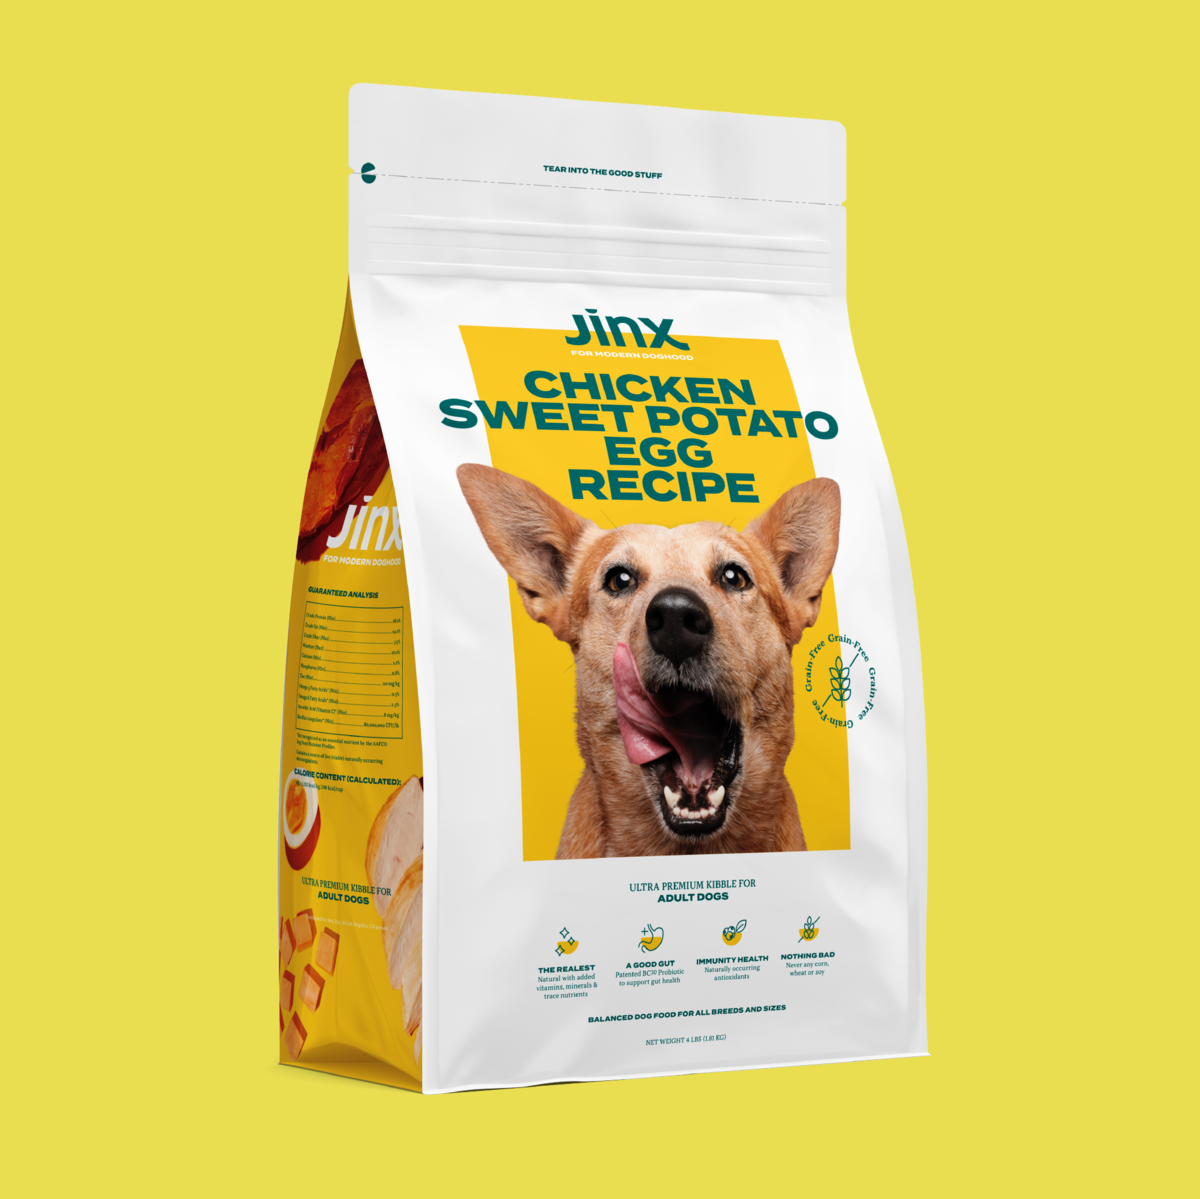 Jinx chicken, sweet potato, egg dog food that's grain free